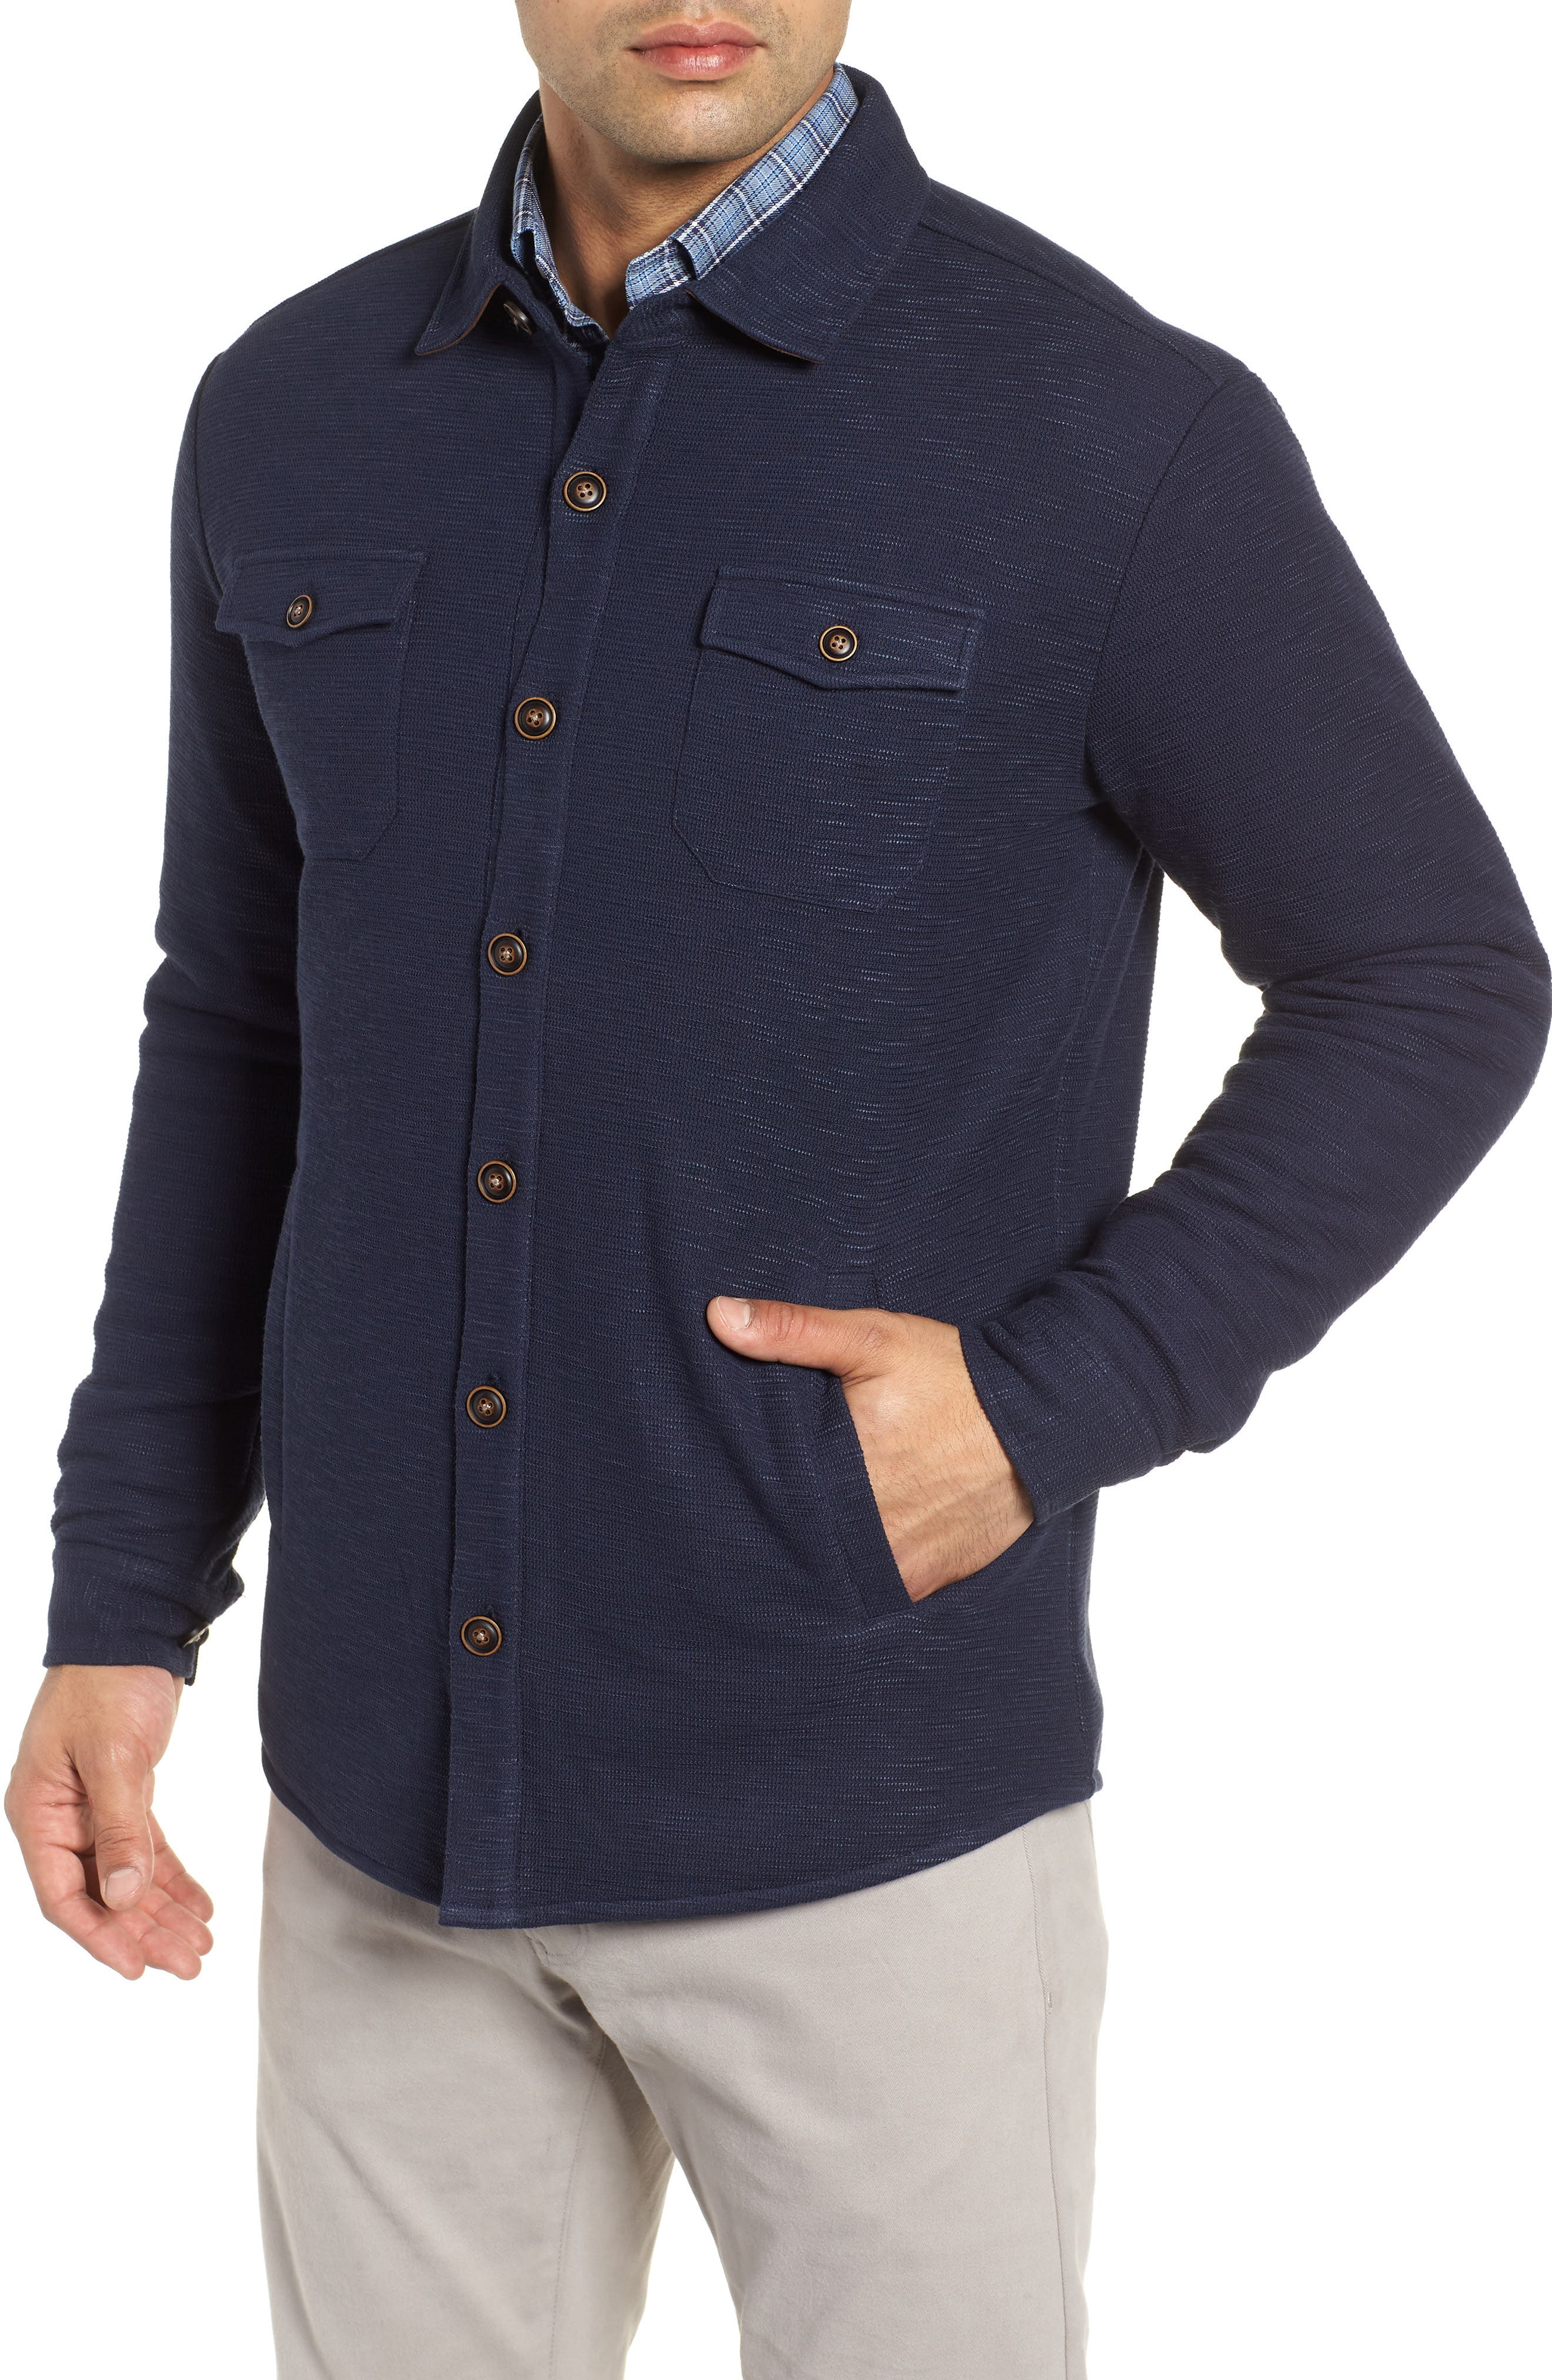 PETER MILLAR,                             Mountainside Shirt Jacket,                             Alternate thumbnail 4, color,                             ATLANTIC BLUE